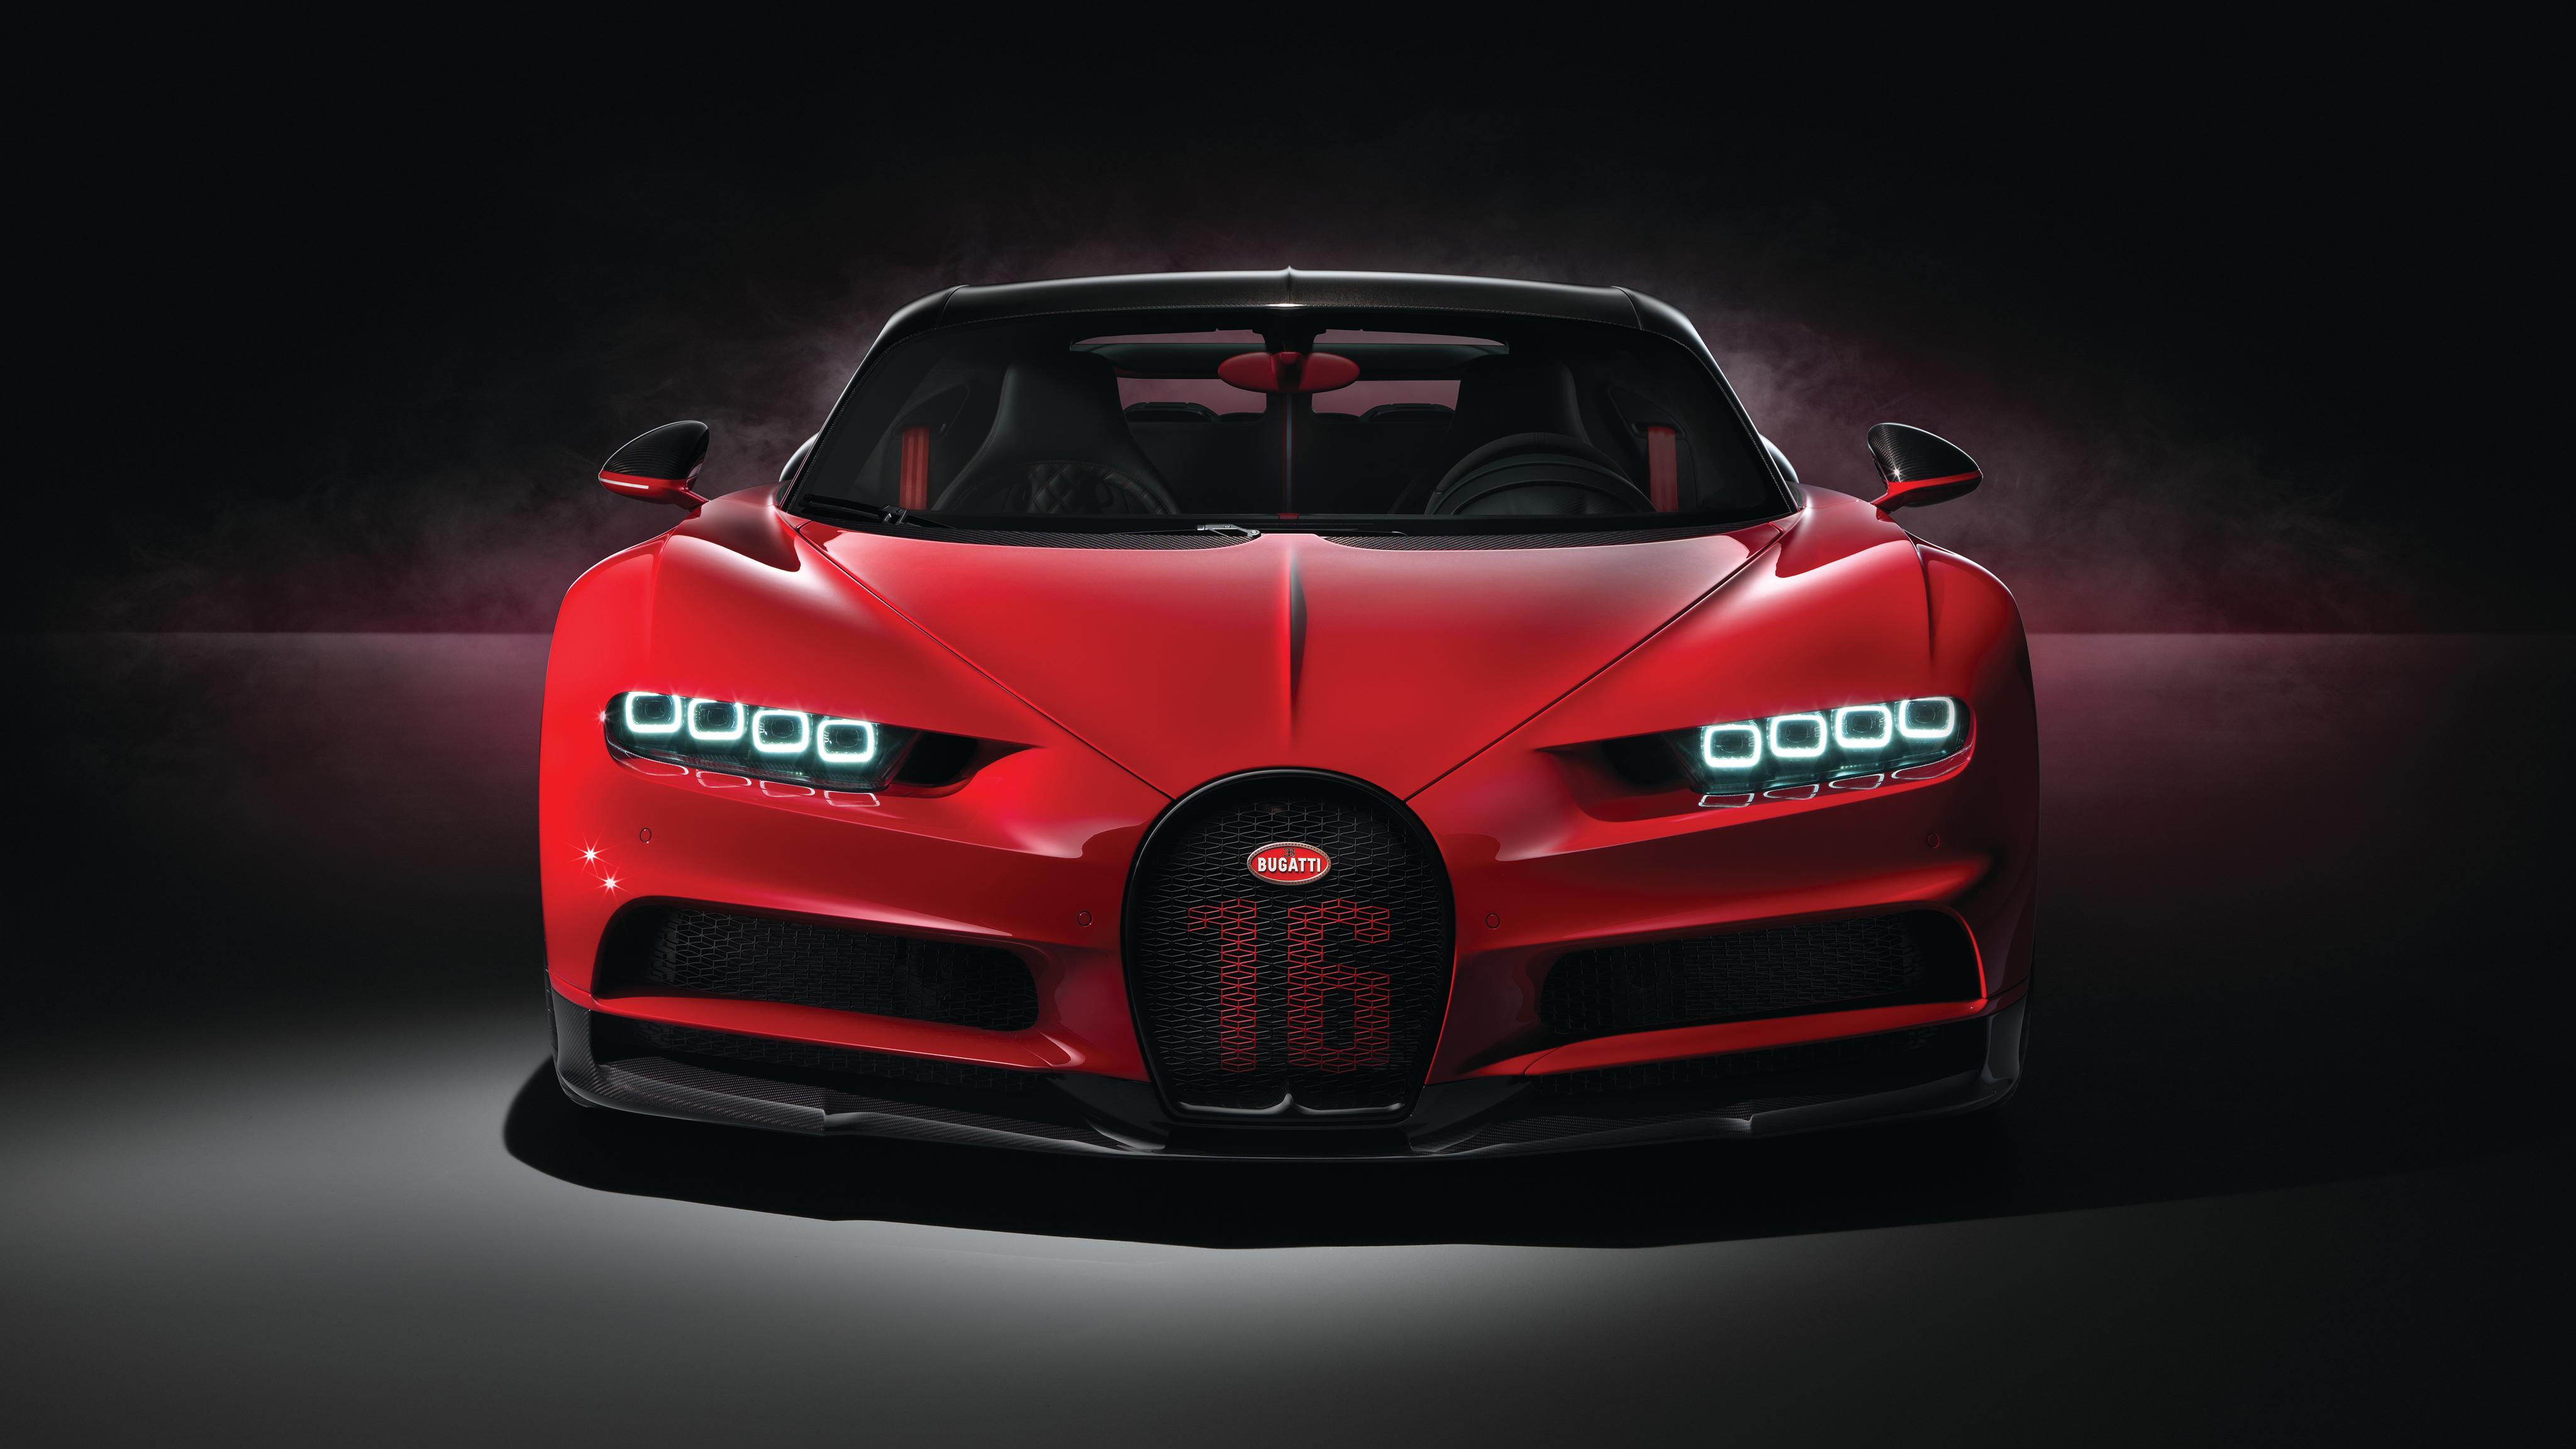 2018 bugatti chiron sport 4k 4 wallpaper hd car wallpapers id 9960. Black Bedroom Furniture Sets. Home Design Ideas